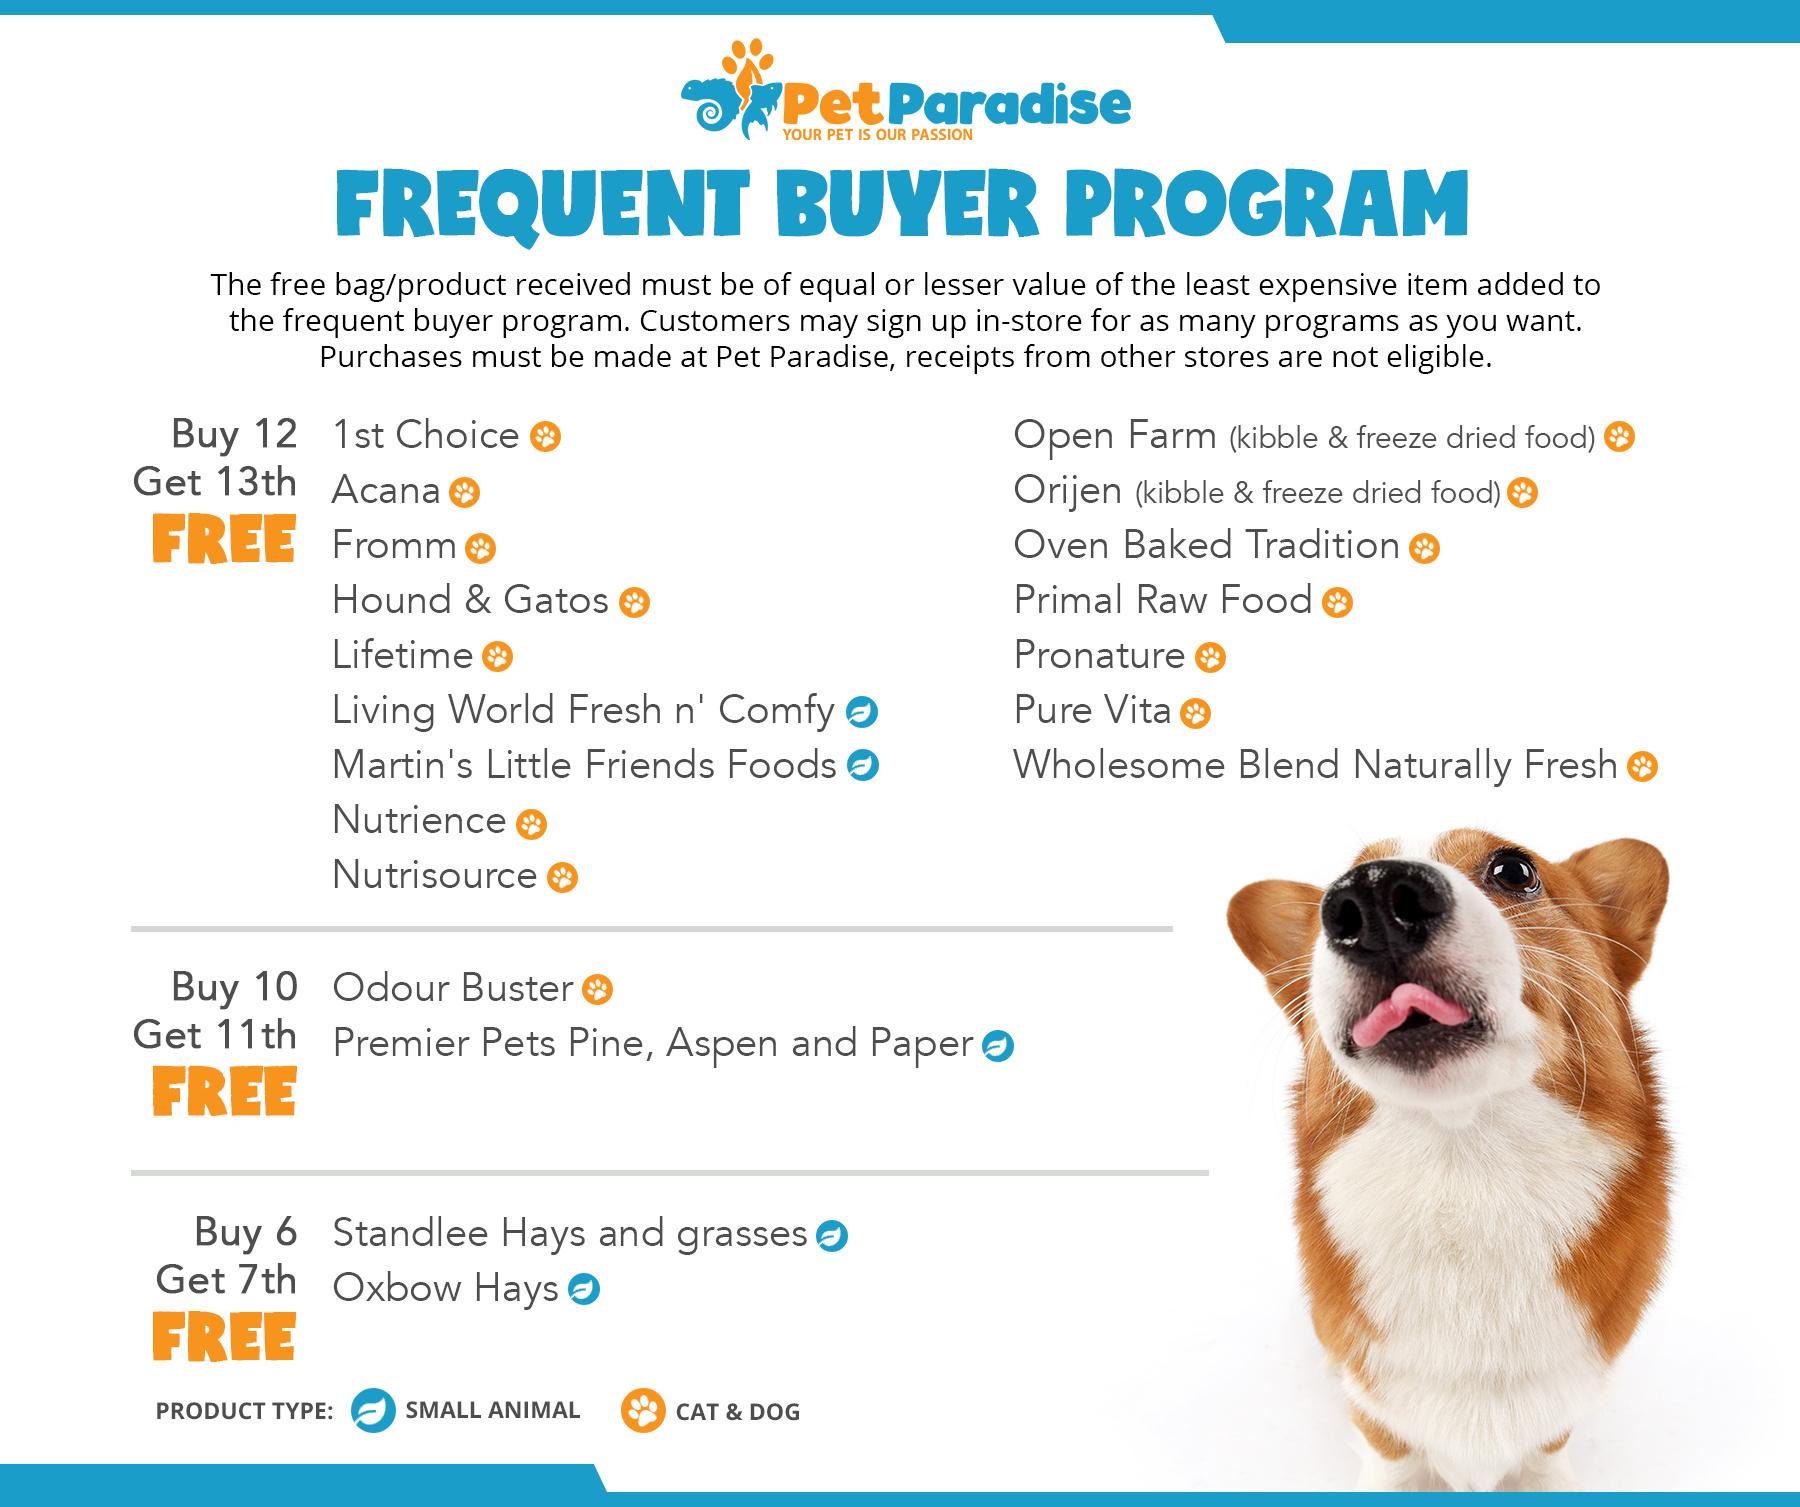 Frequent Buyer Program